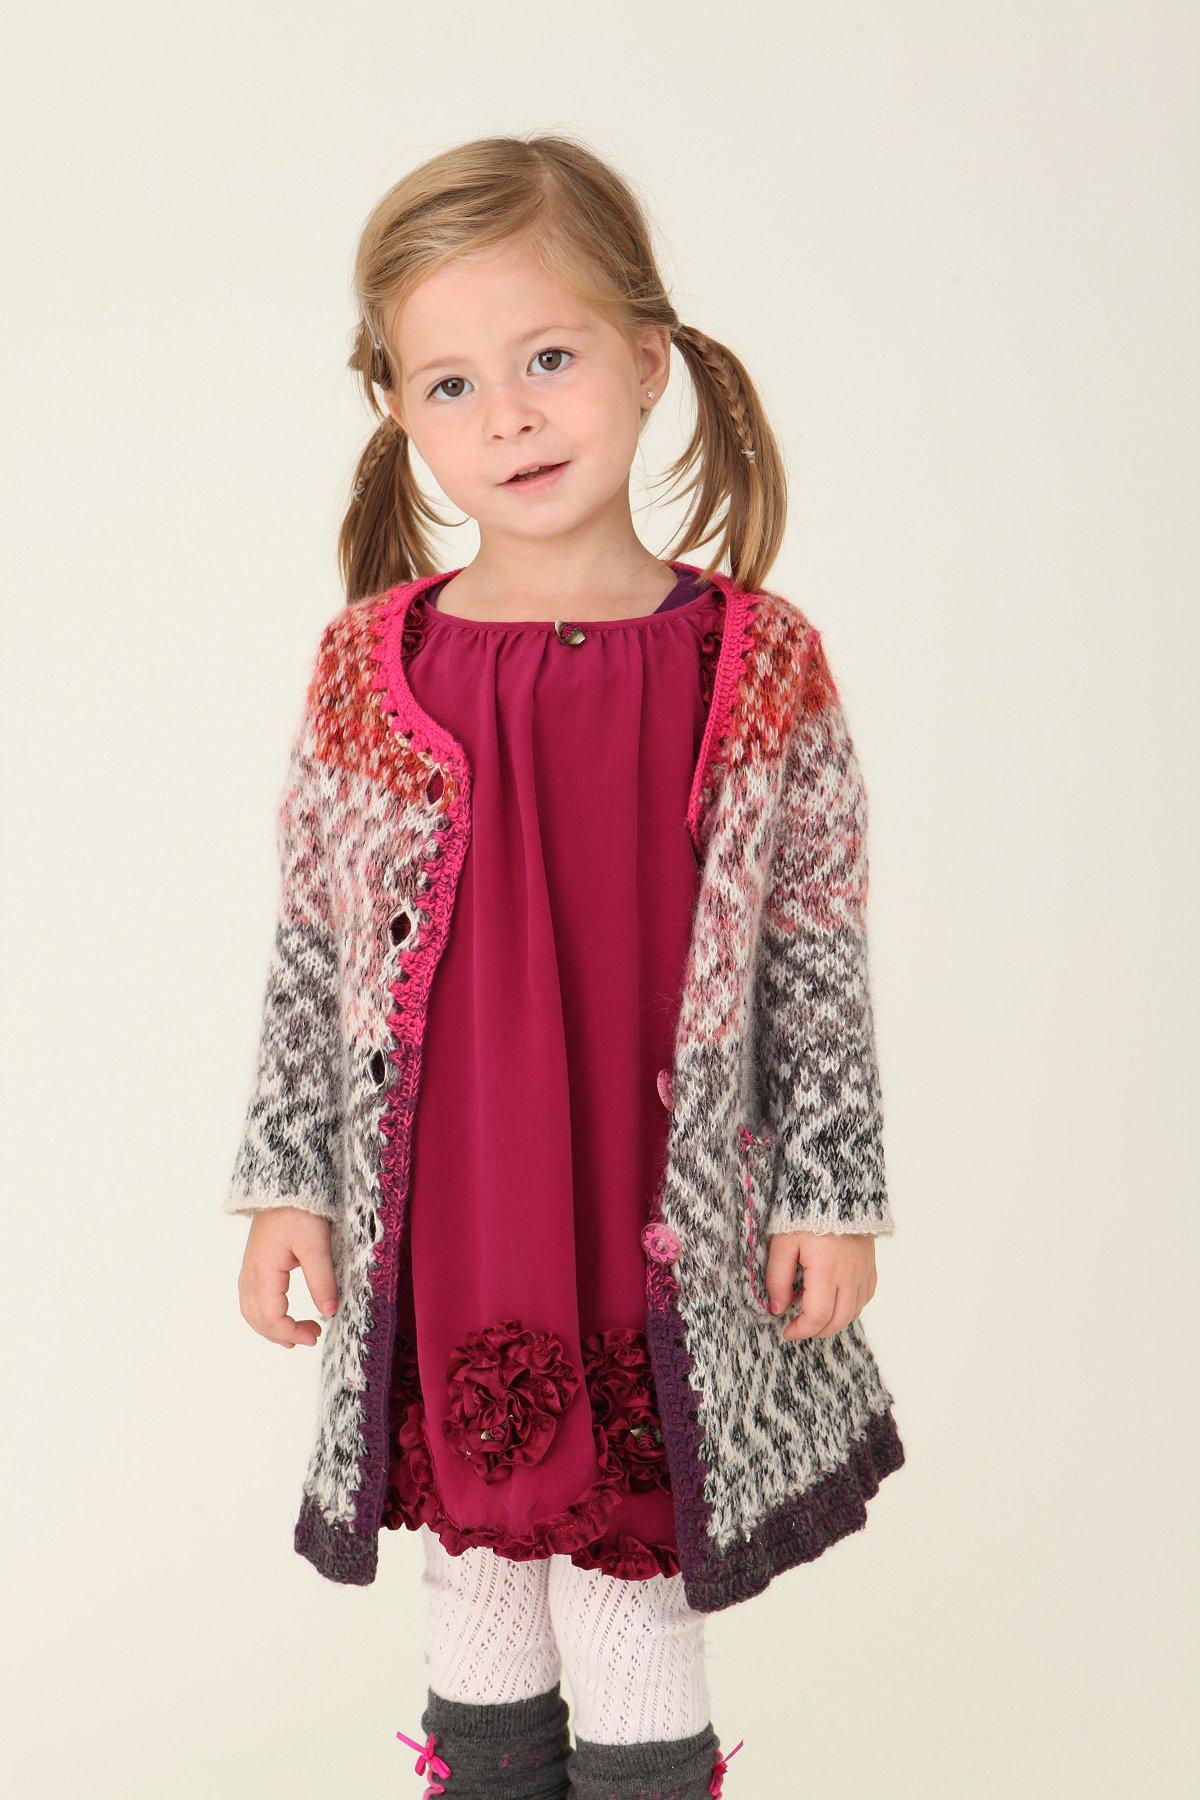 Wee People Thumbelina Sweater Coat